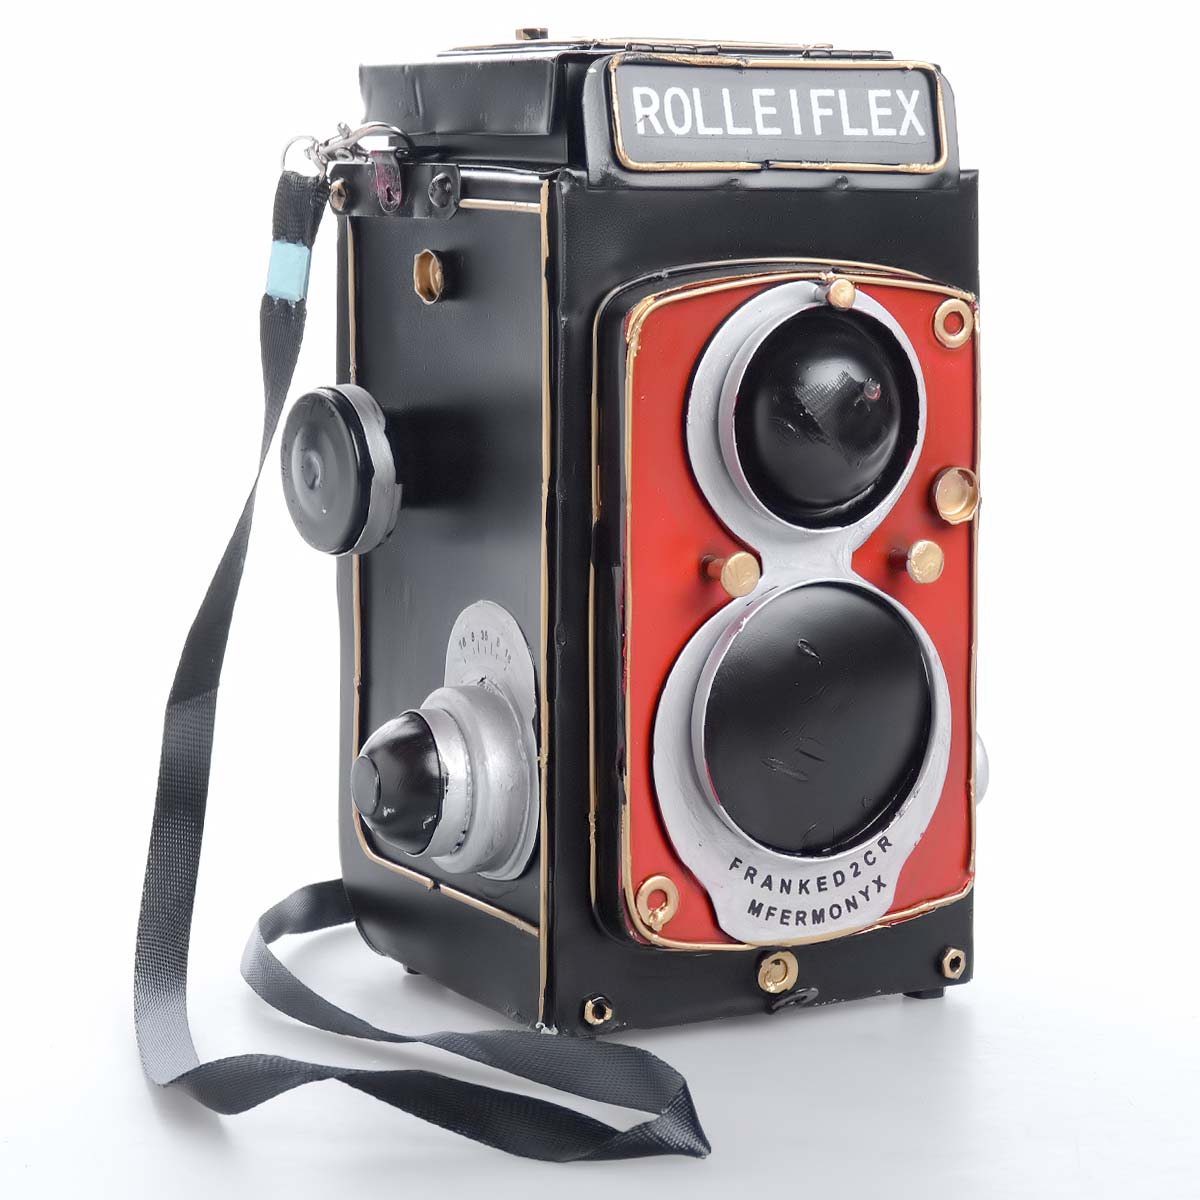 Vintage χειροποίητη διακοσμητική φωτοφραφική μηχανή μεταλλική - OEM 51555